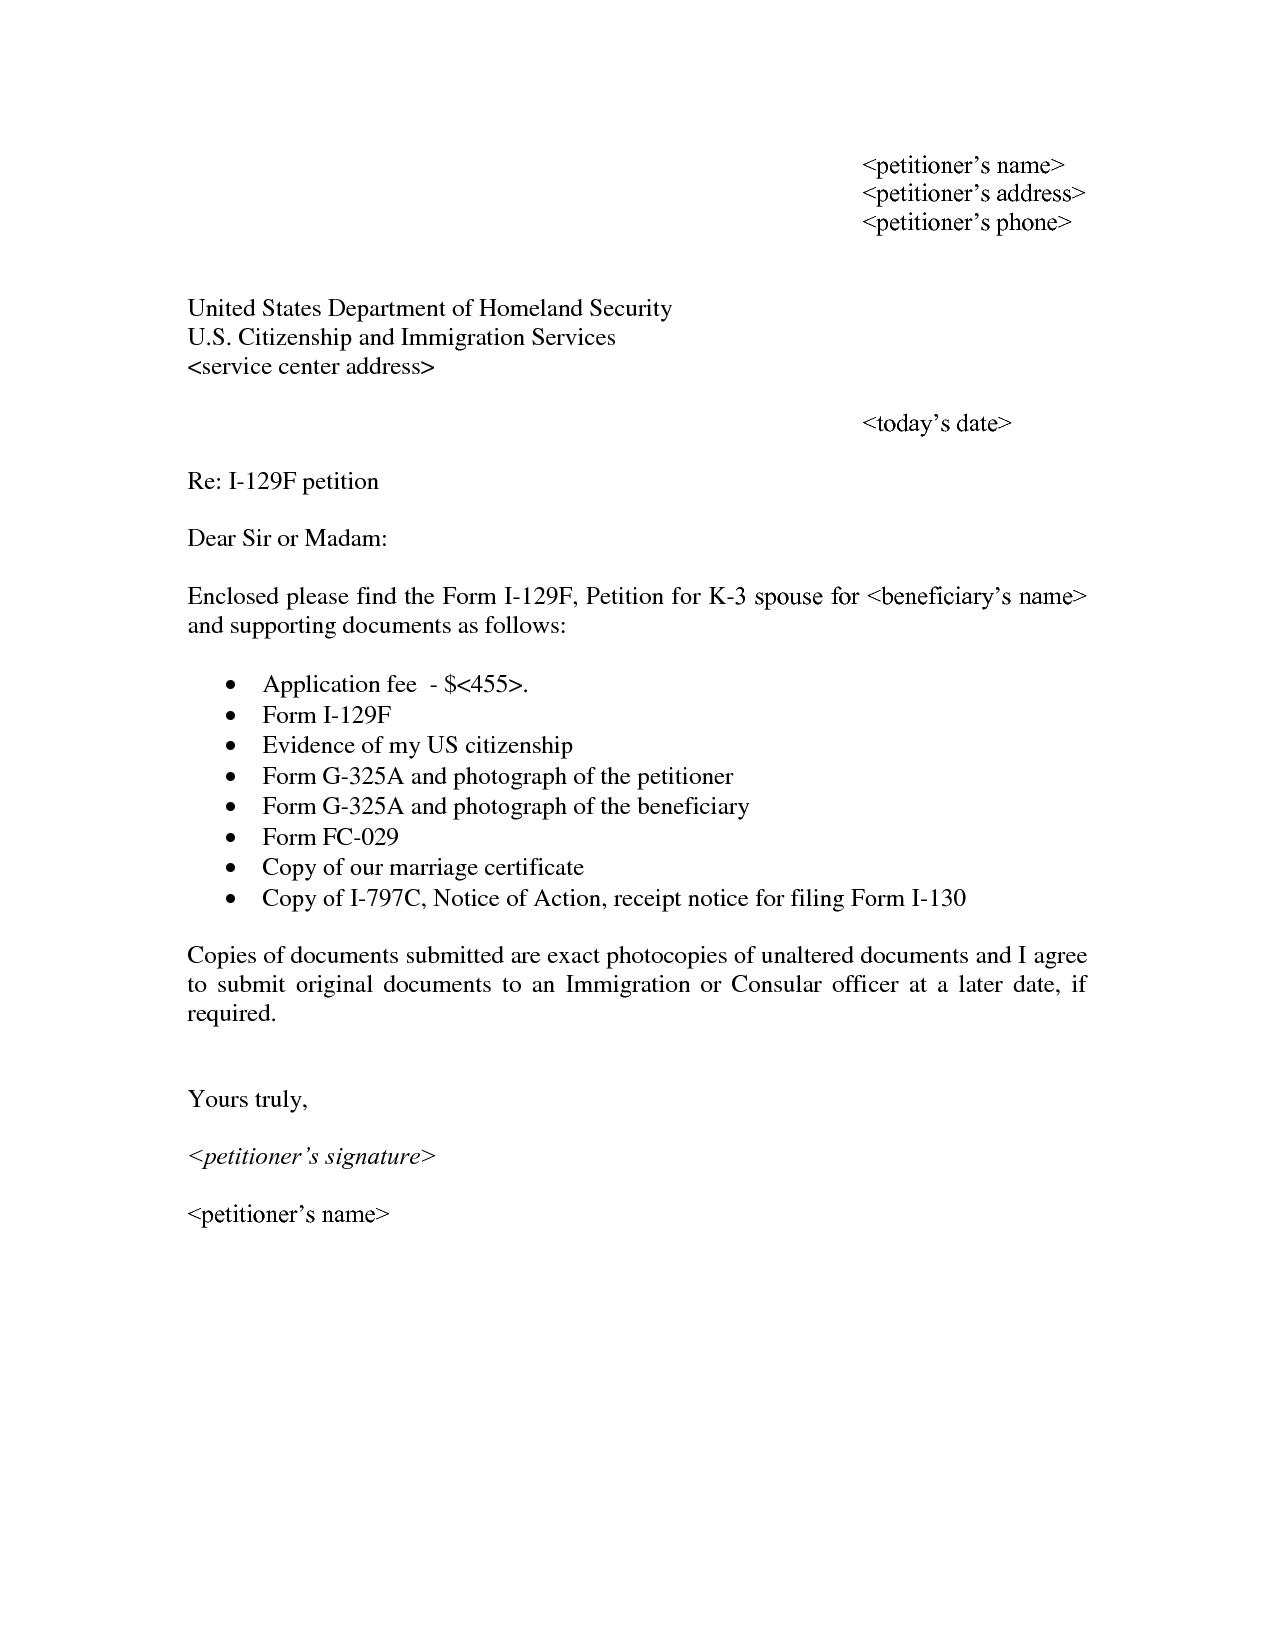 Cover letter doc uk sample cover letter for sending documents guamreview spiritdancerdesigns Images